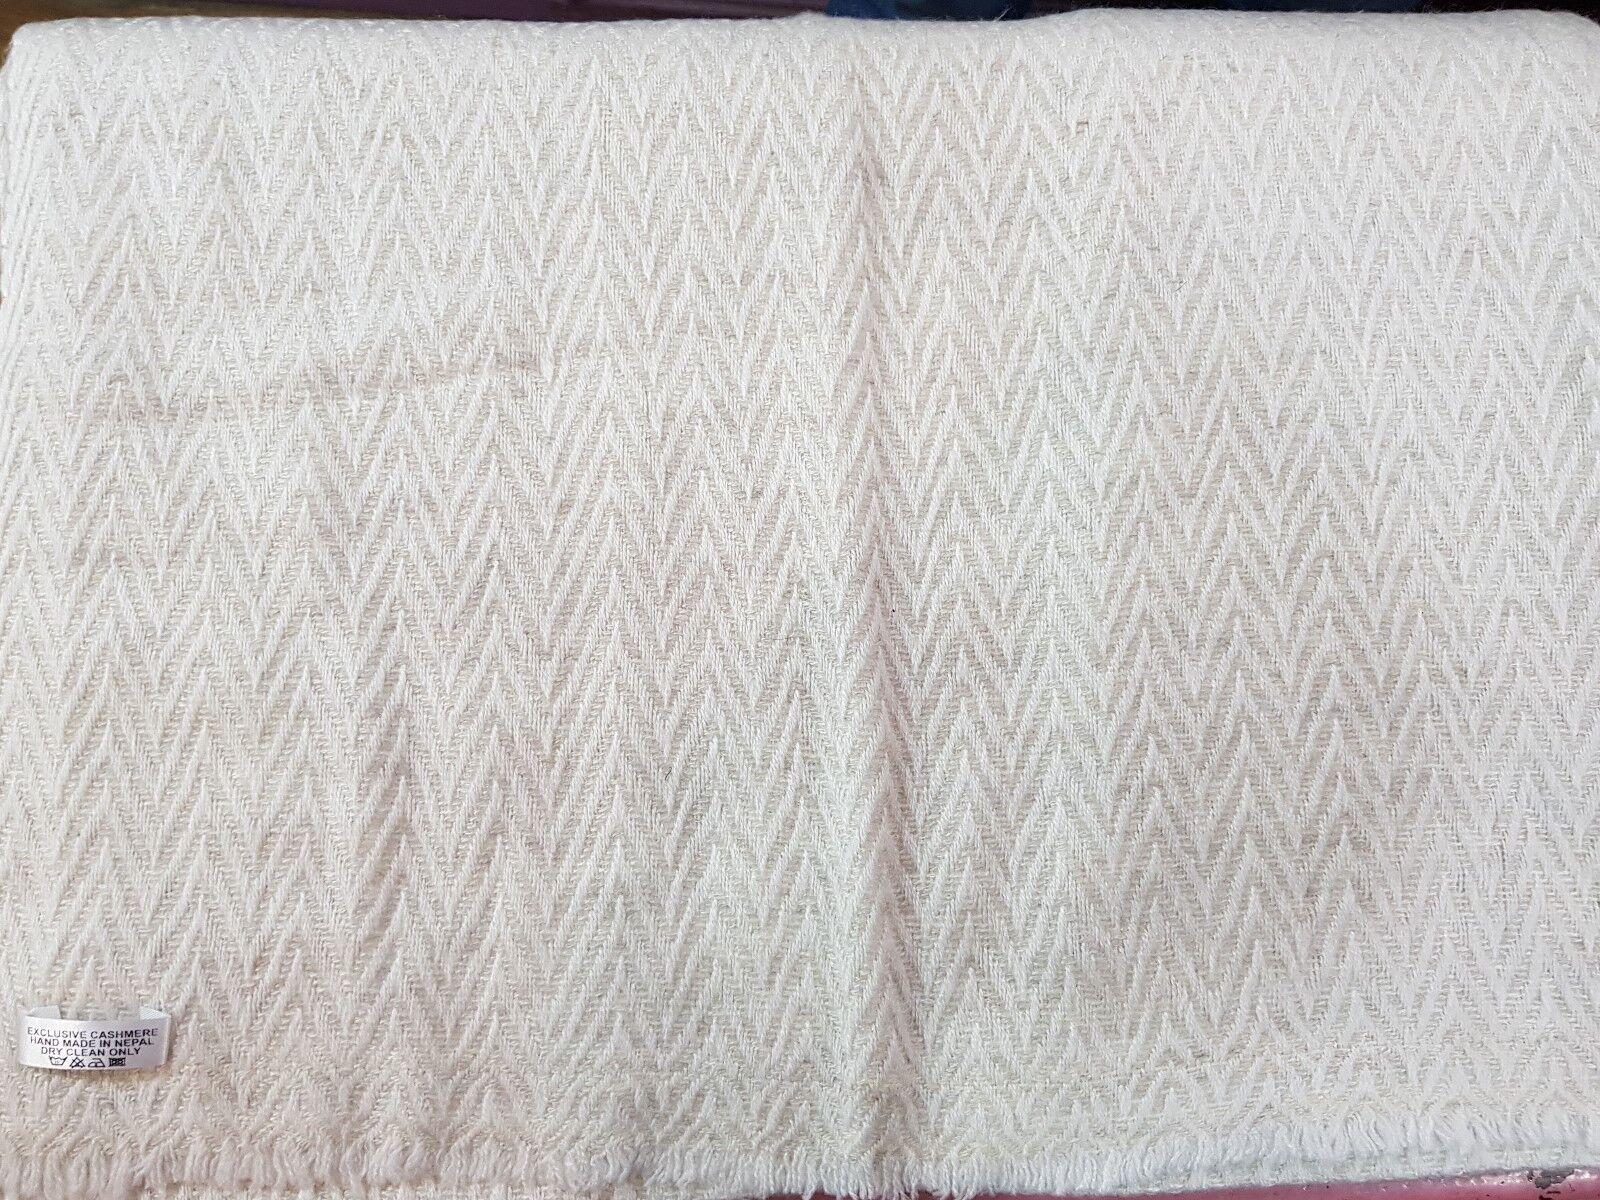 Heavy Wool Pashmina Cashmere Blanket Shawl Wrap Handmade Nepal Unisex 8ply